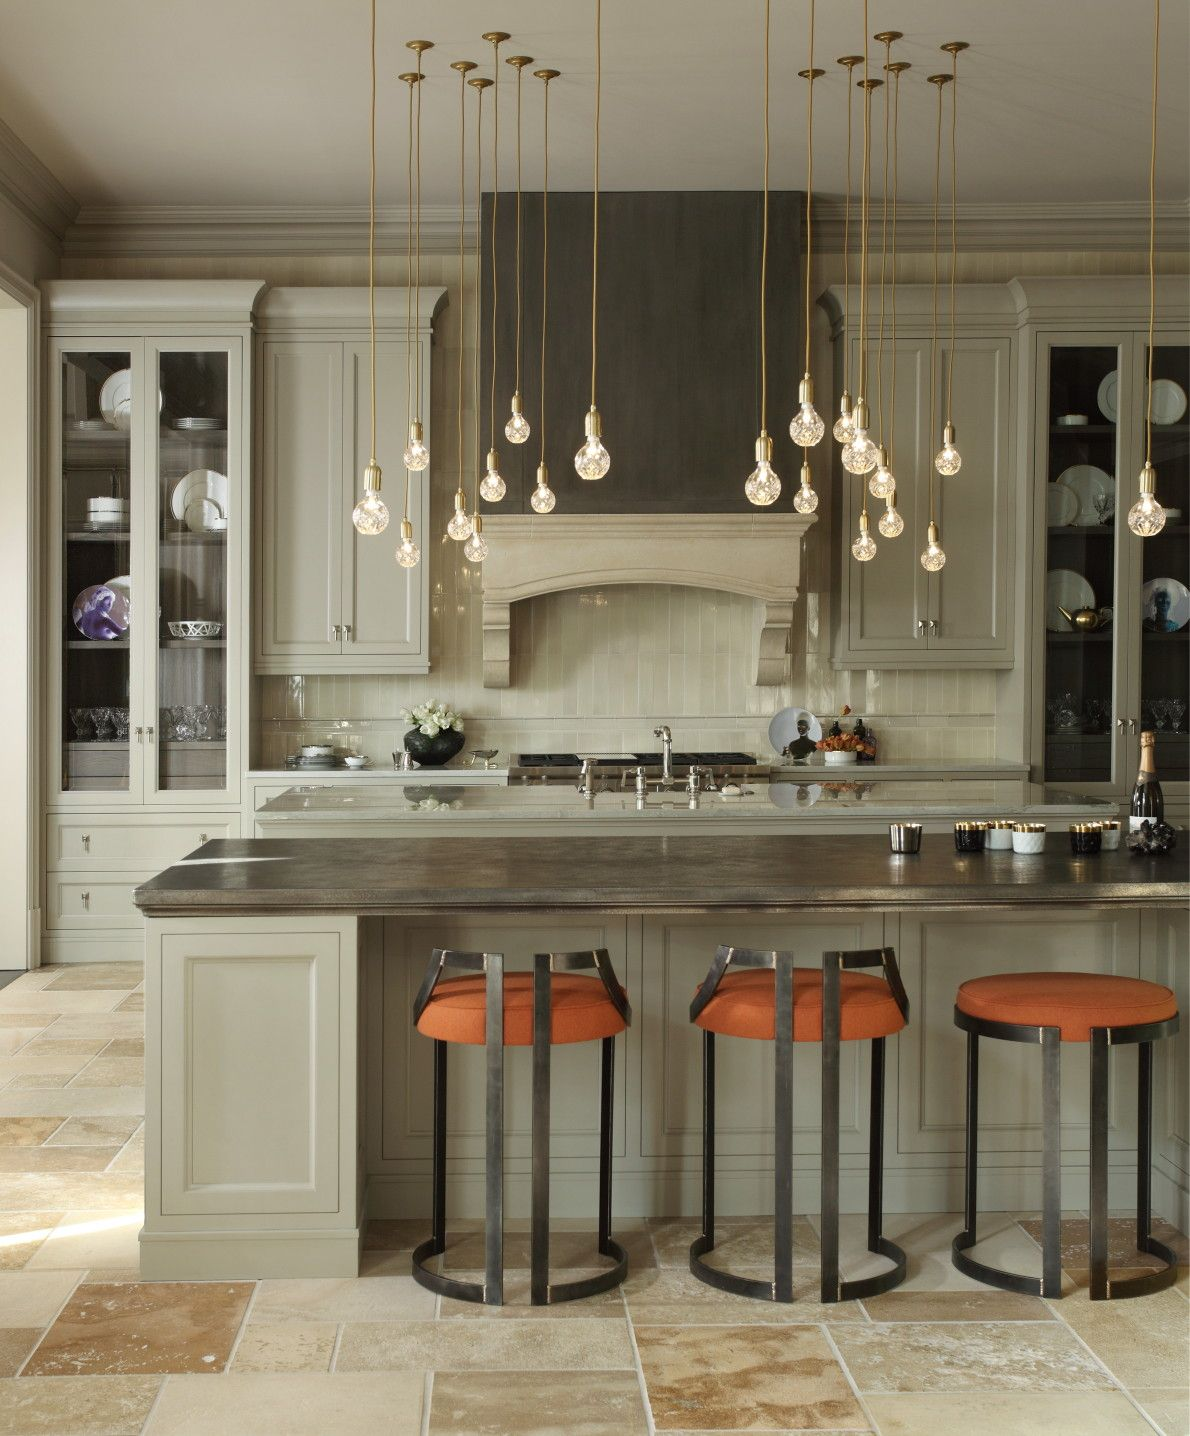 Karpaty cabinets inc custom kitchen cabinets atlanta for Atlanta ga kitchen cabinets